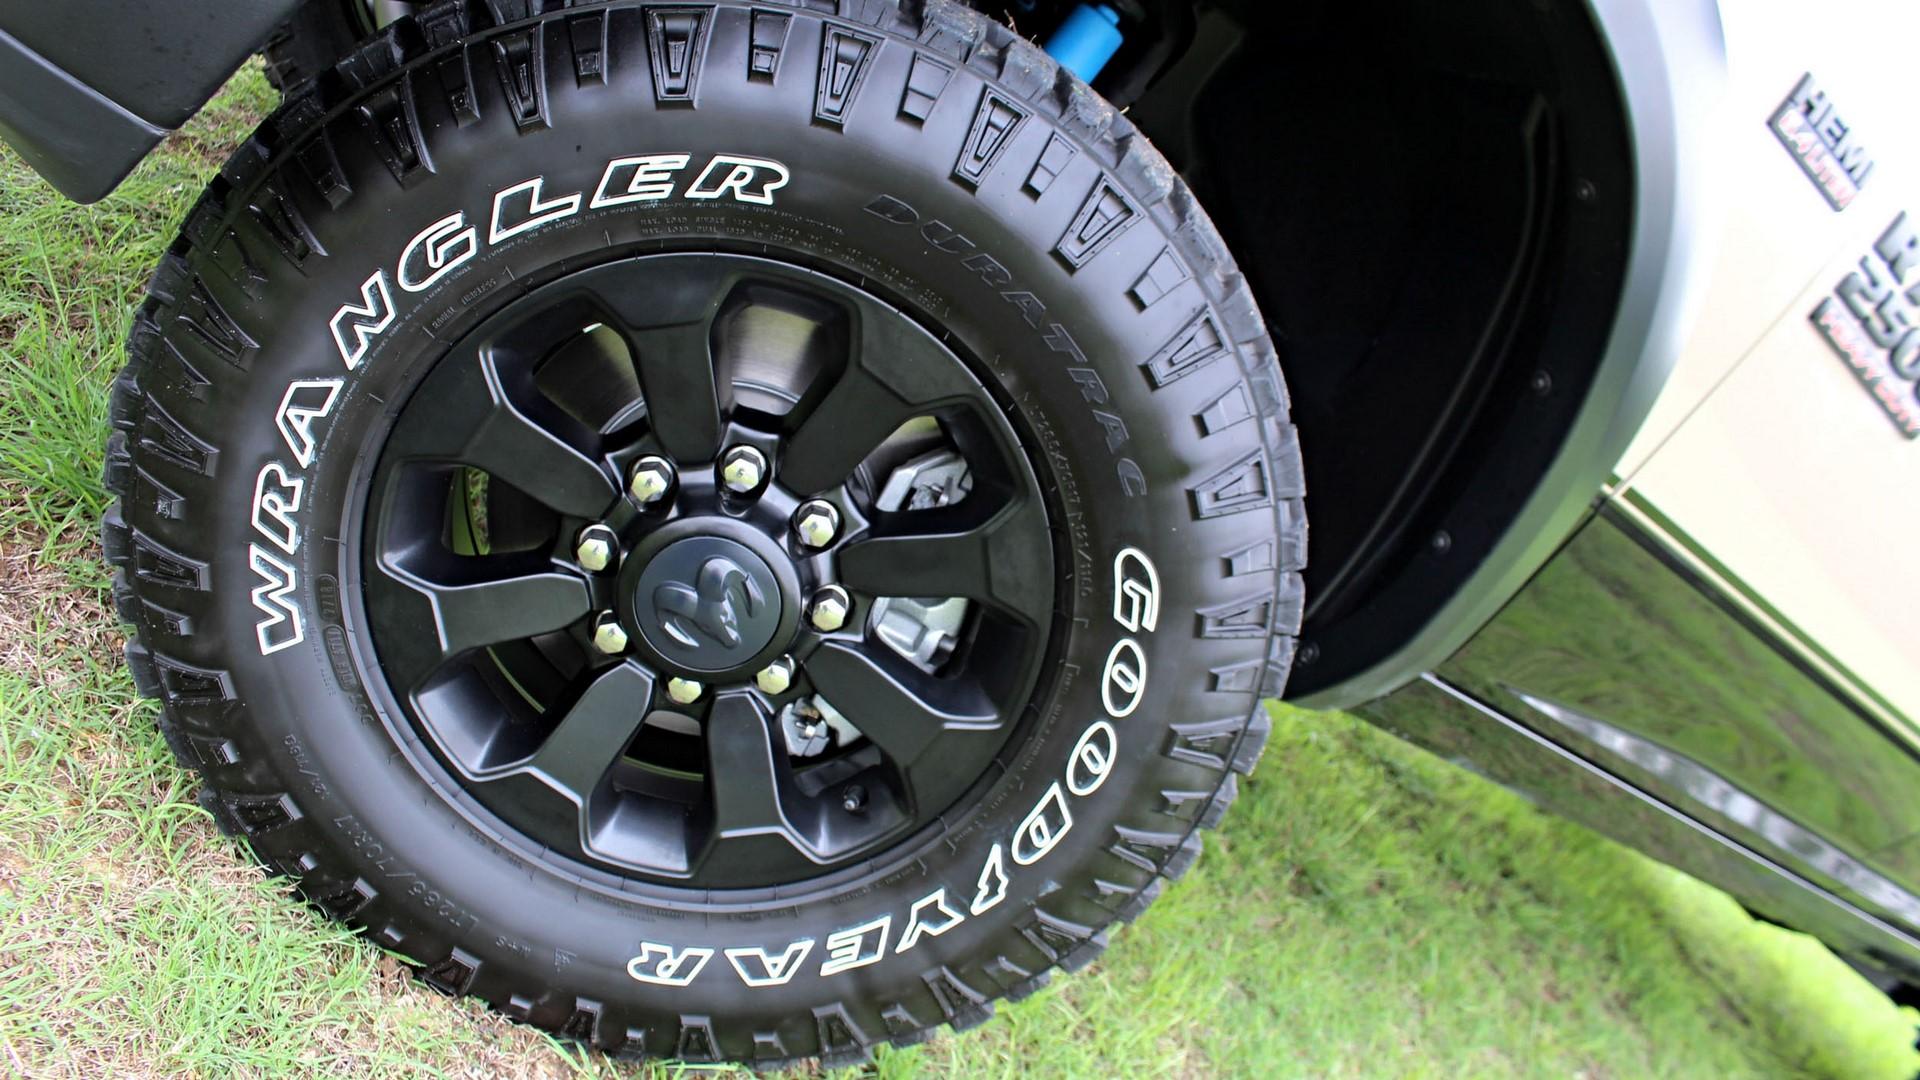 ram-2500-powerwagon-xtras-details-tire-3-wide-1